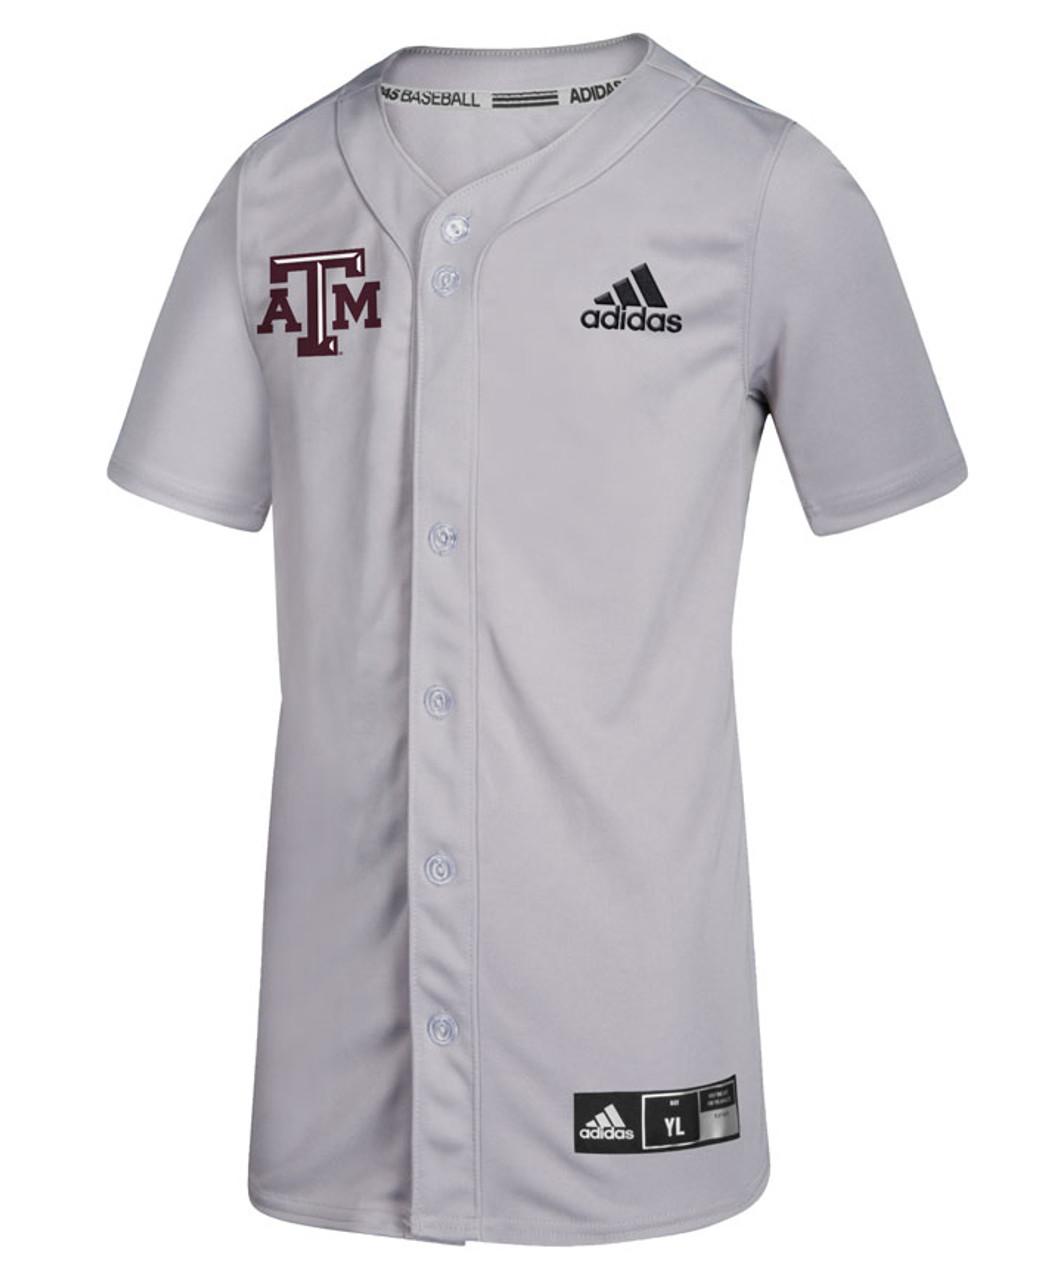 Adidas Youth Grey Diamond King Elite Full Button Baseball Jersey